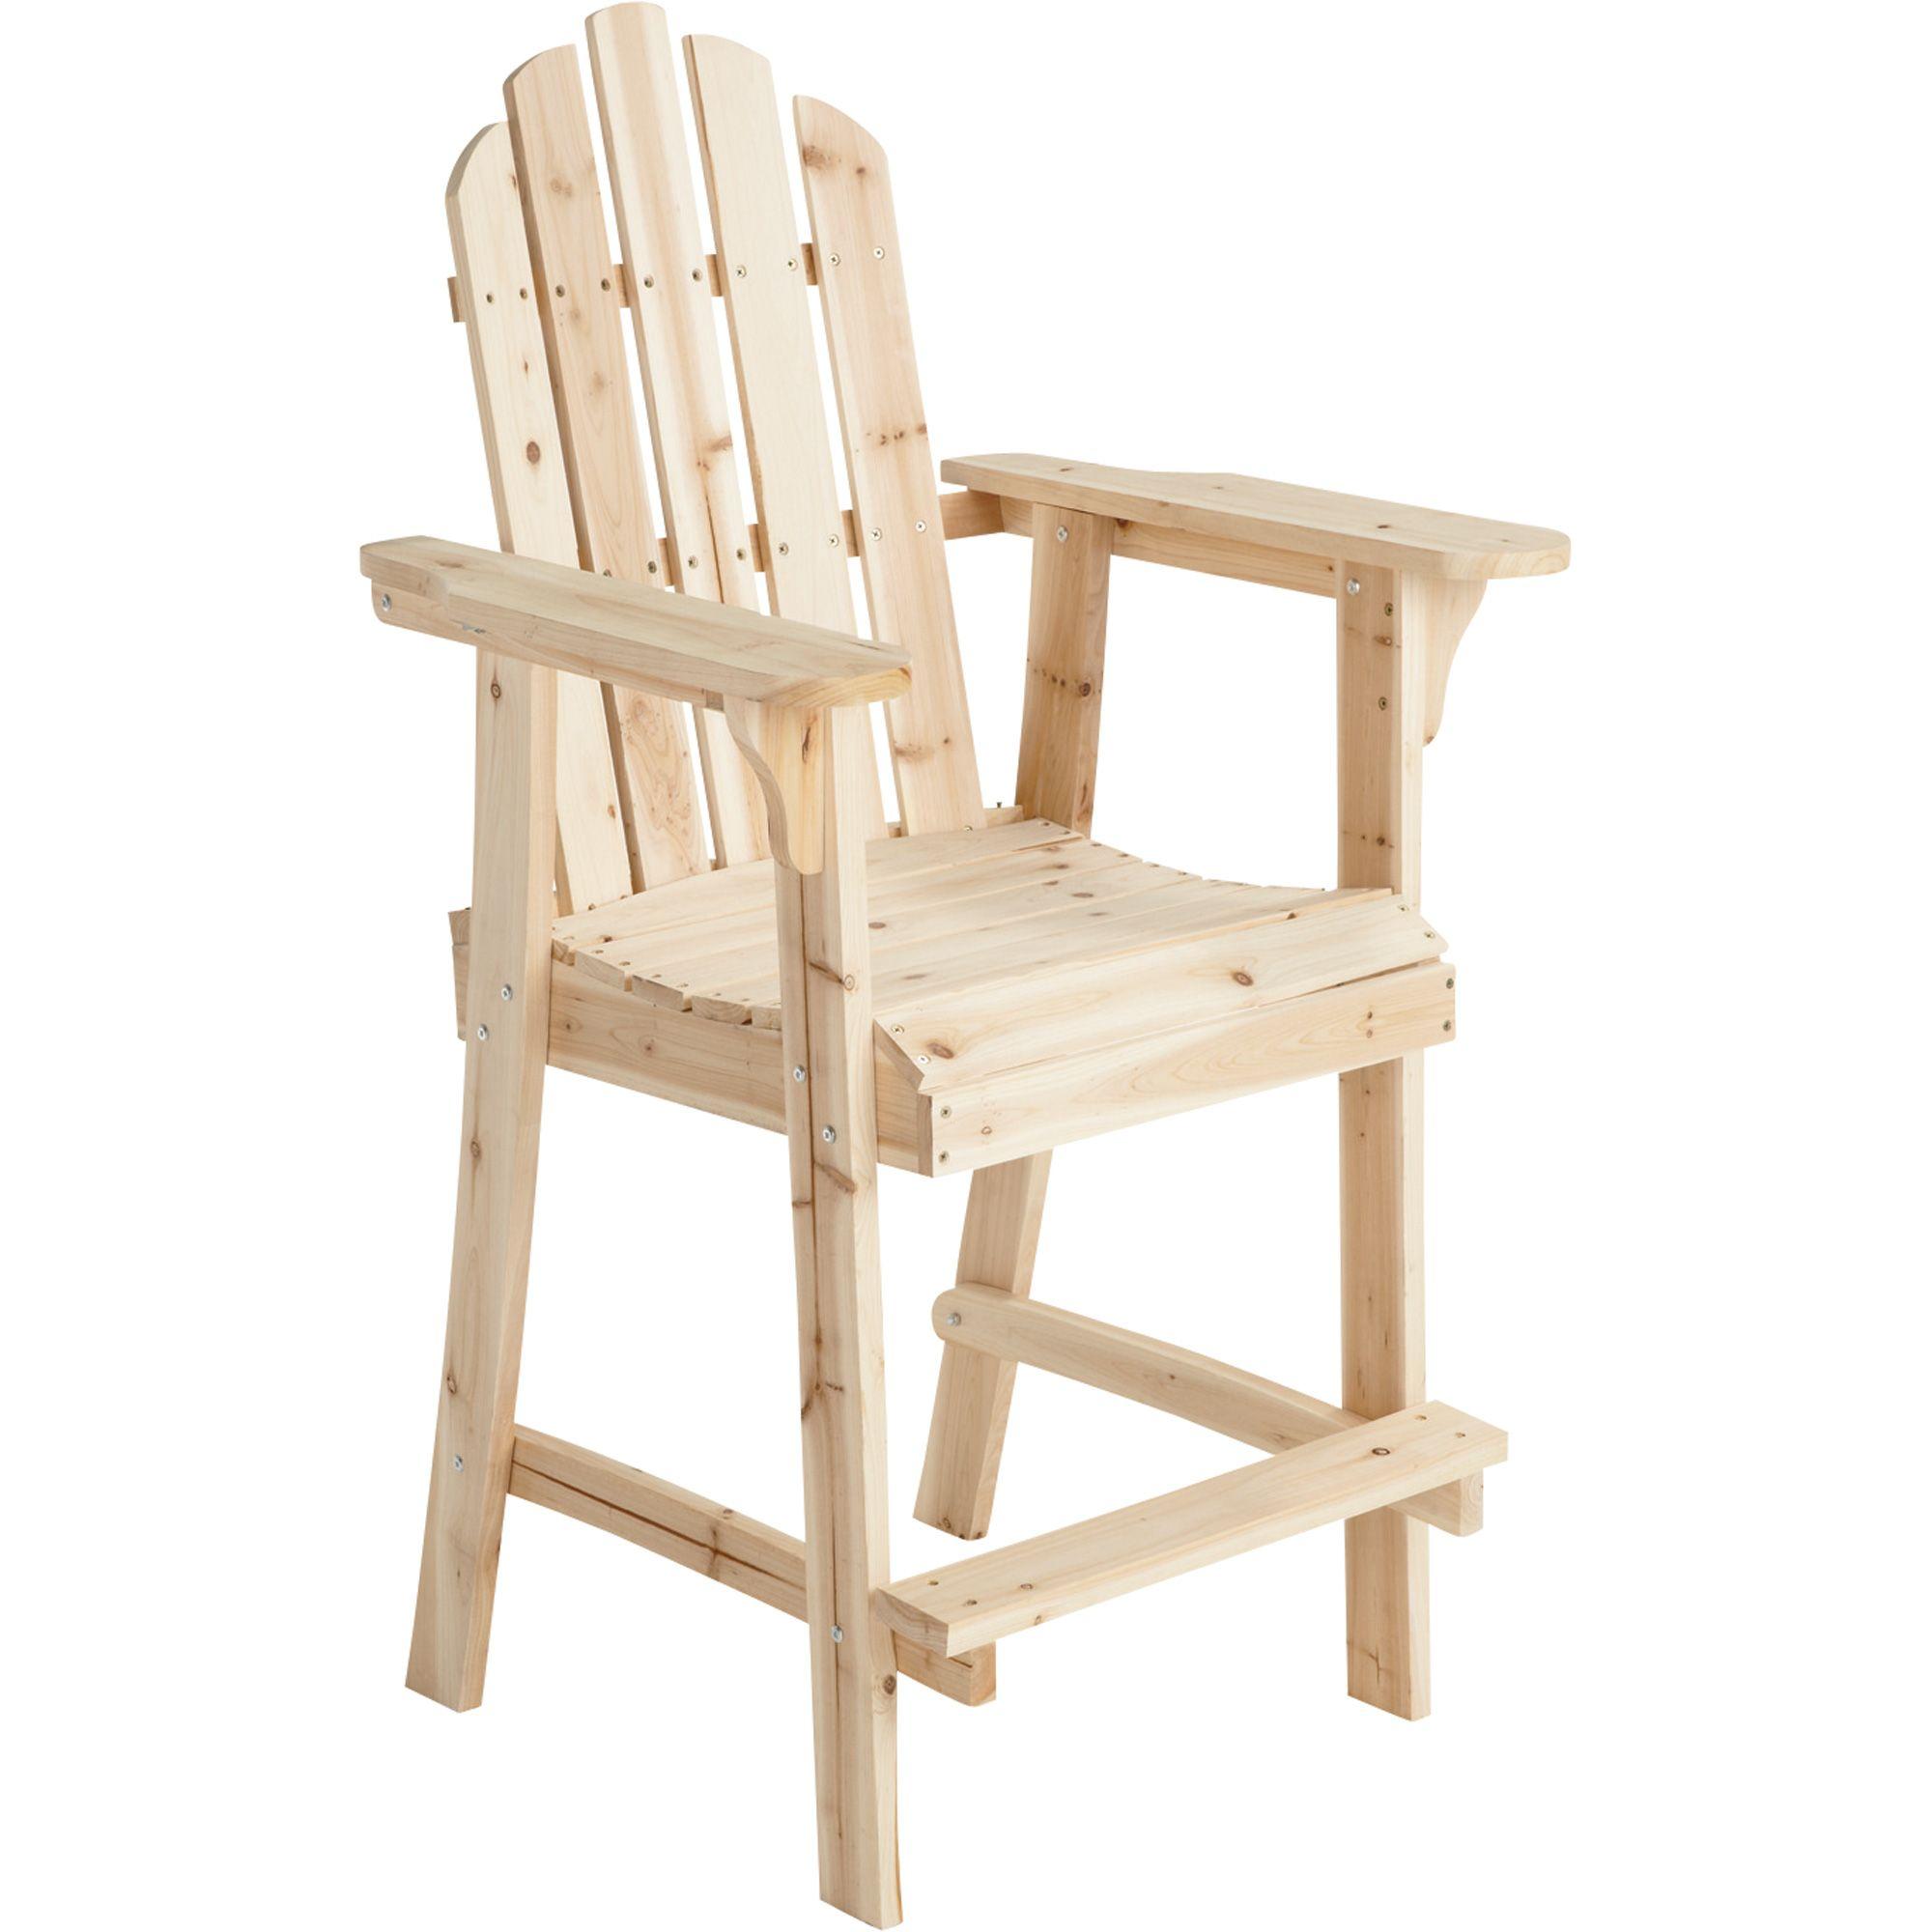 Stonegate Designs Tall Fir Wood Adirondack Chair U2014 30in.L X 25 1/2in